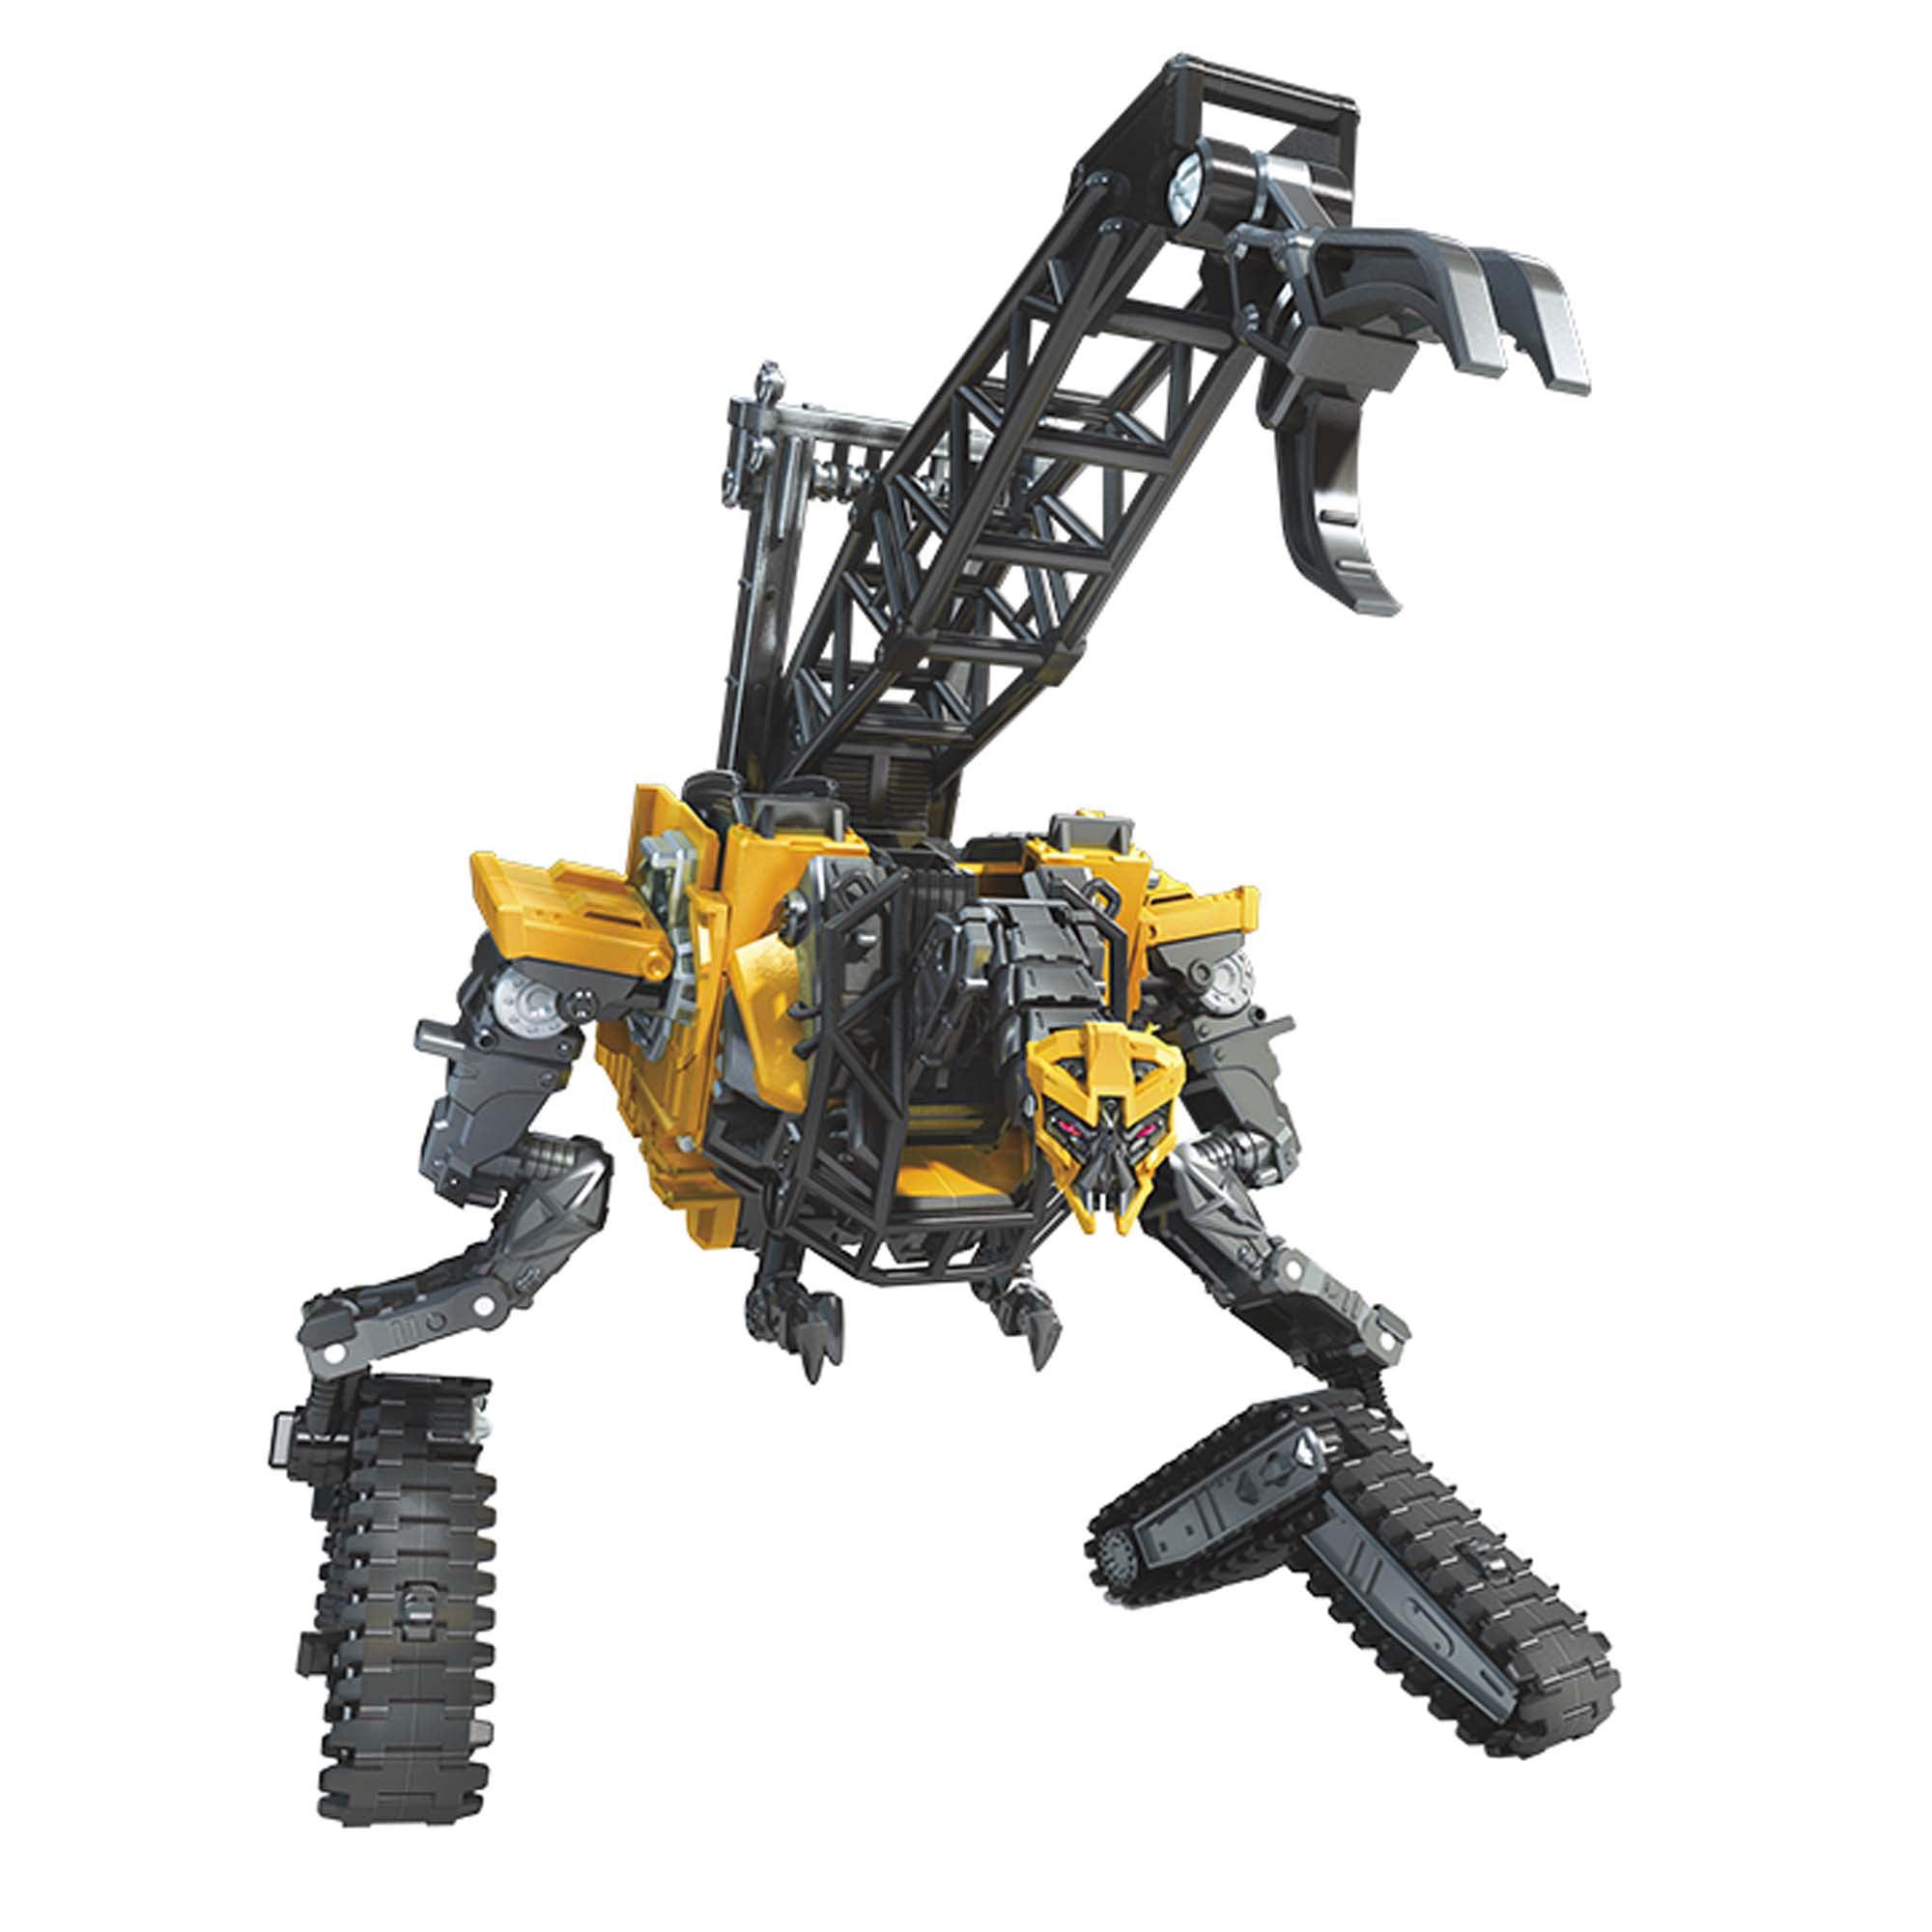 Transformers Toys Studio Series 47 Deluxe Class Transformers: Revenge of the Fallen Movie Constructicon... by Hasbro Inc.